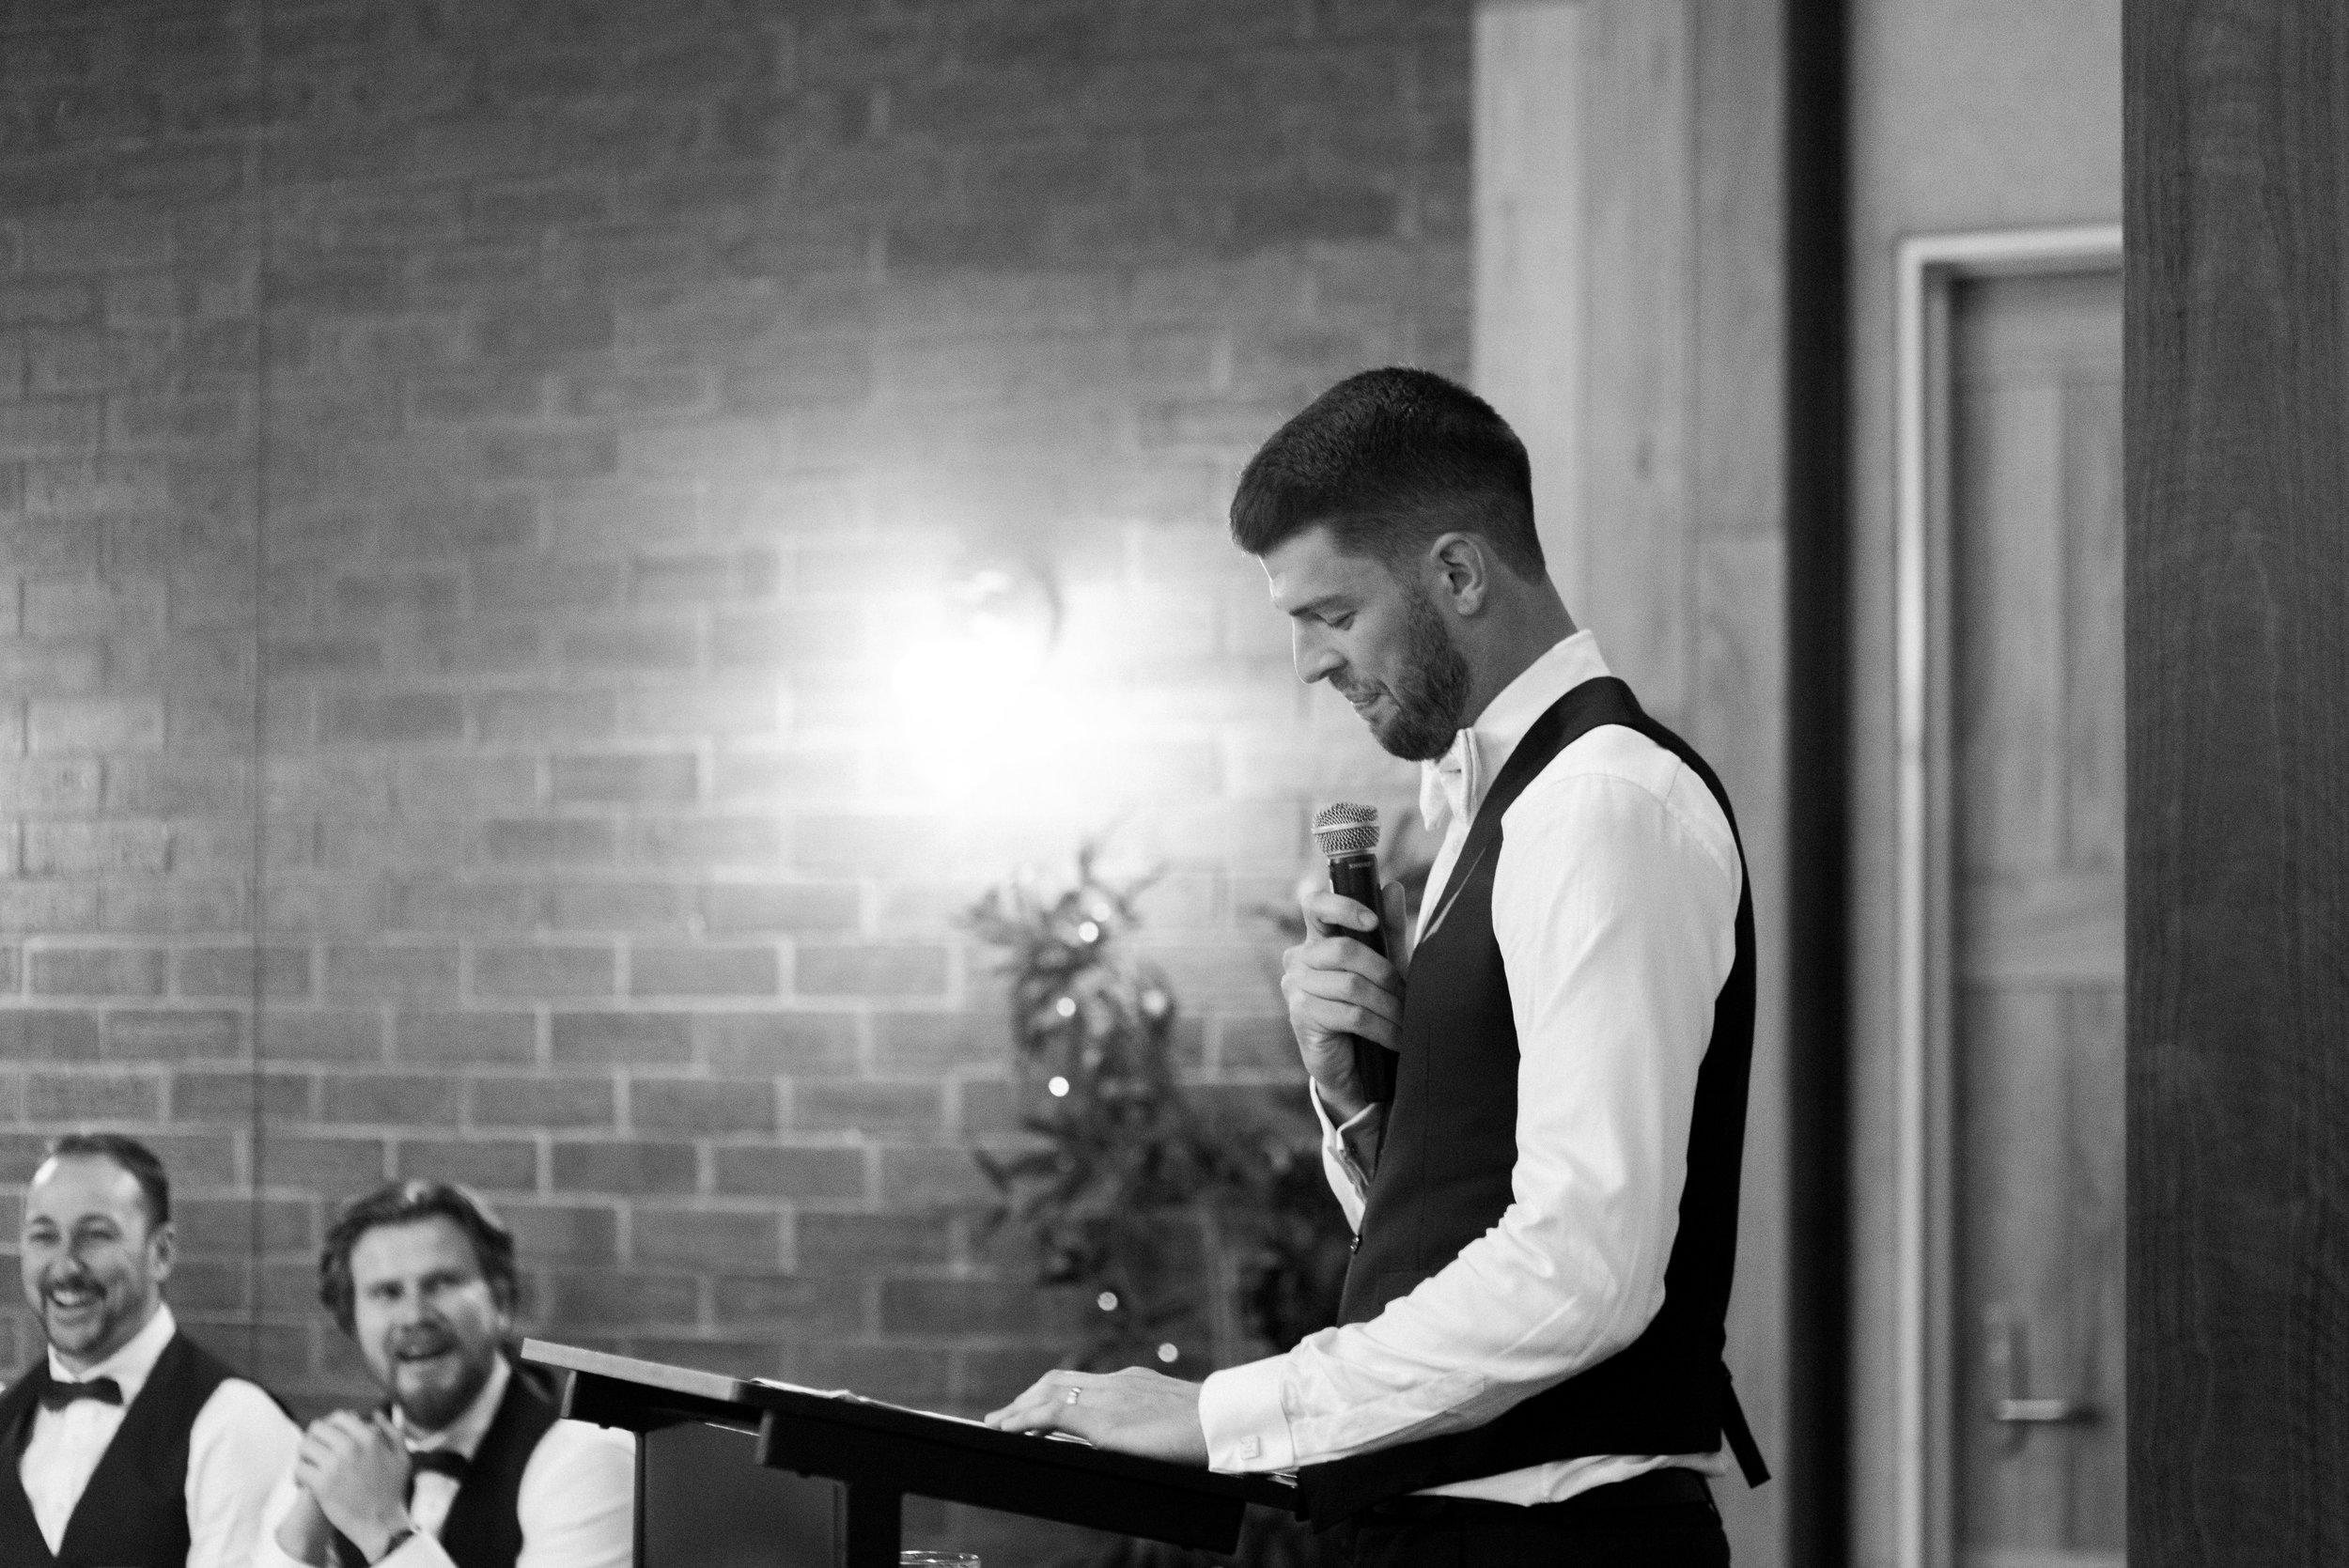 brisbane-city-wedding-photographer-loft-westend-9.jpg